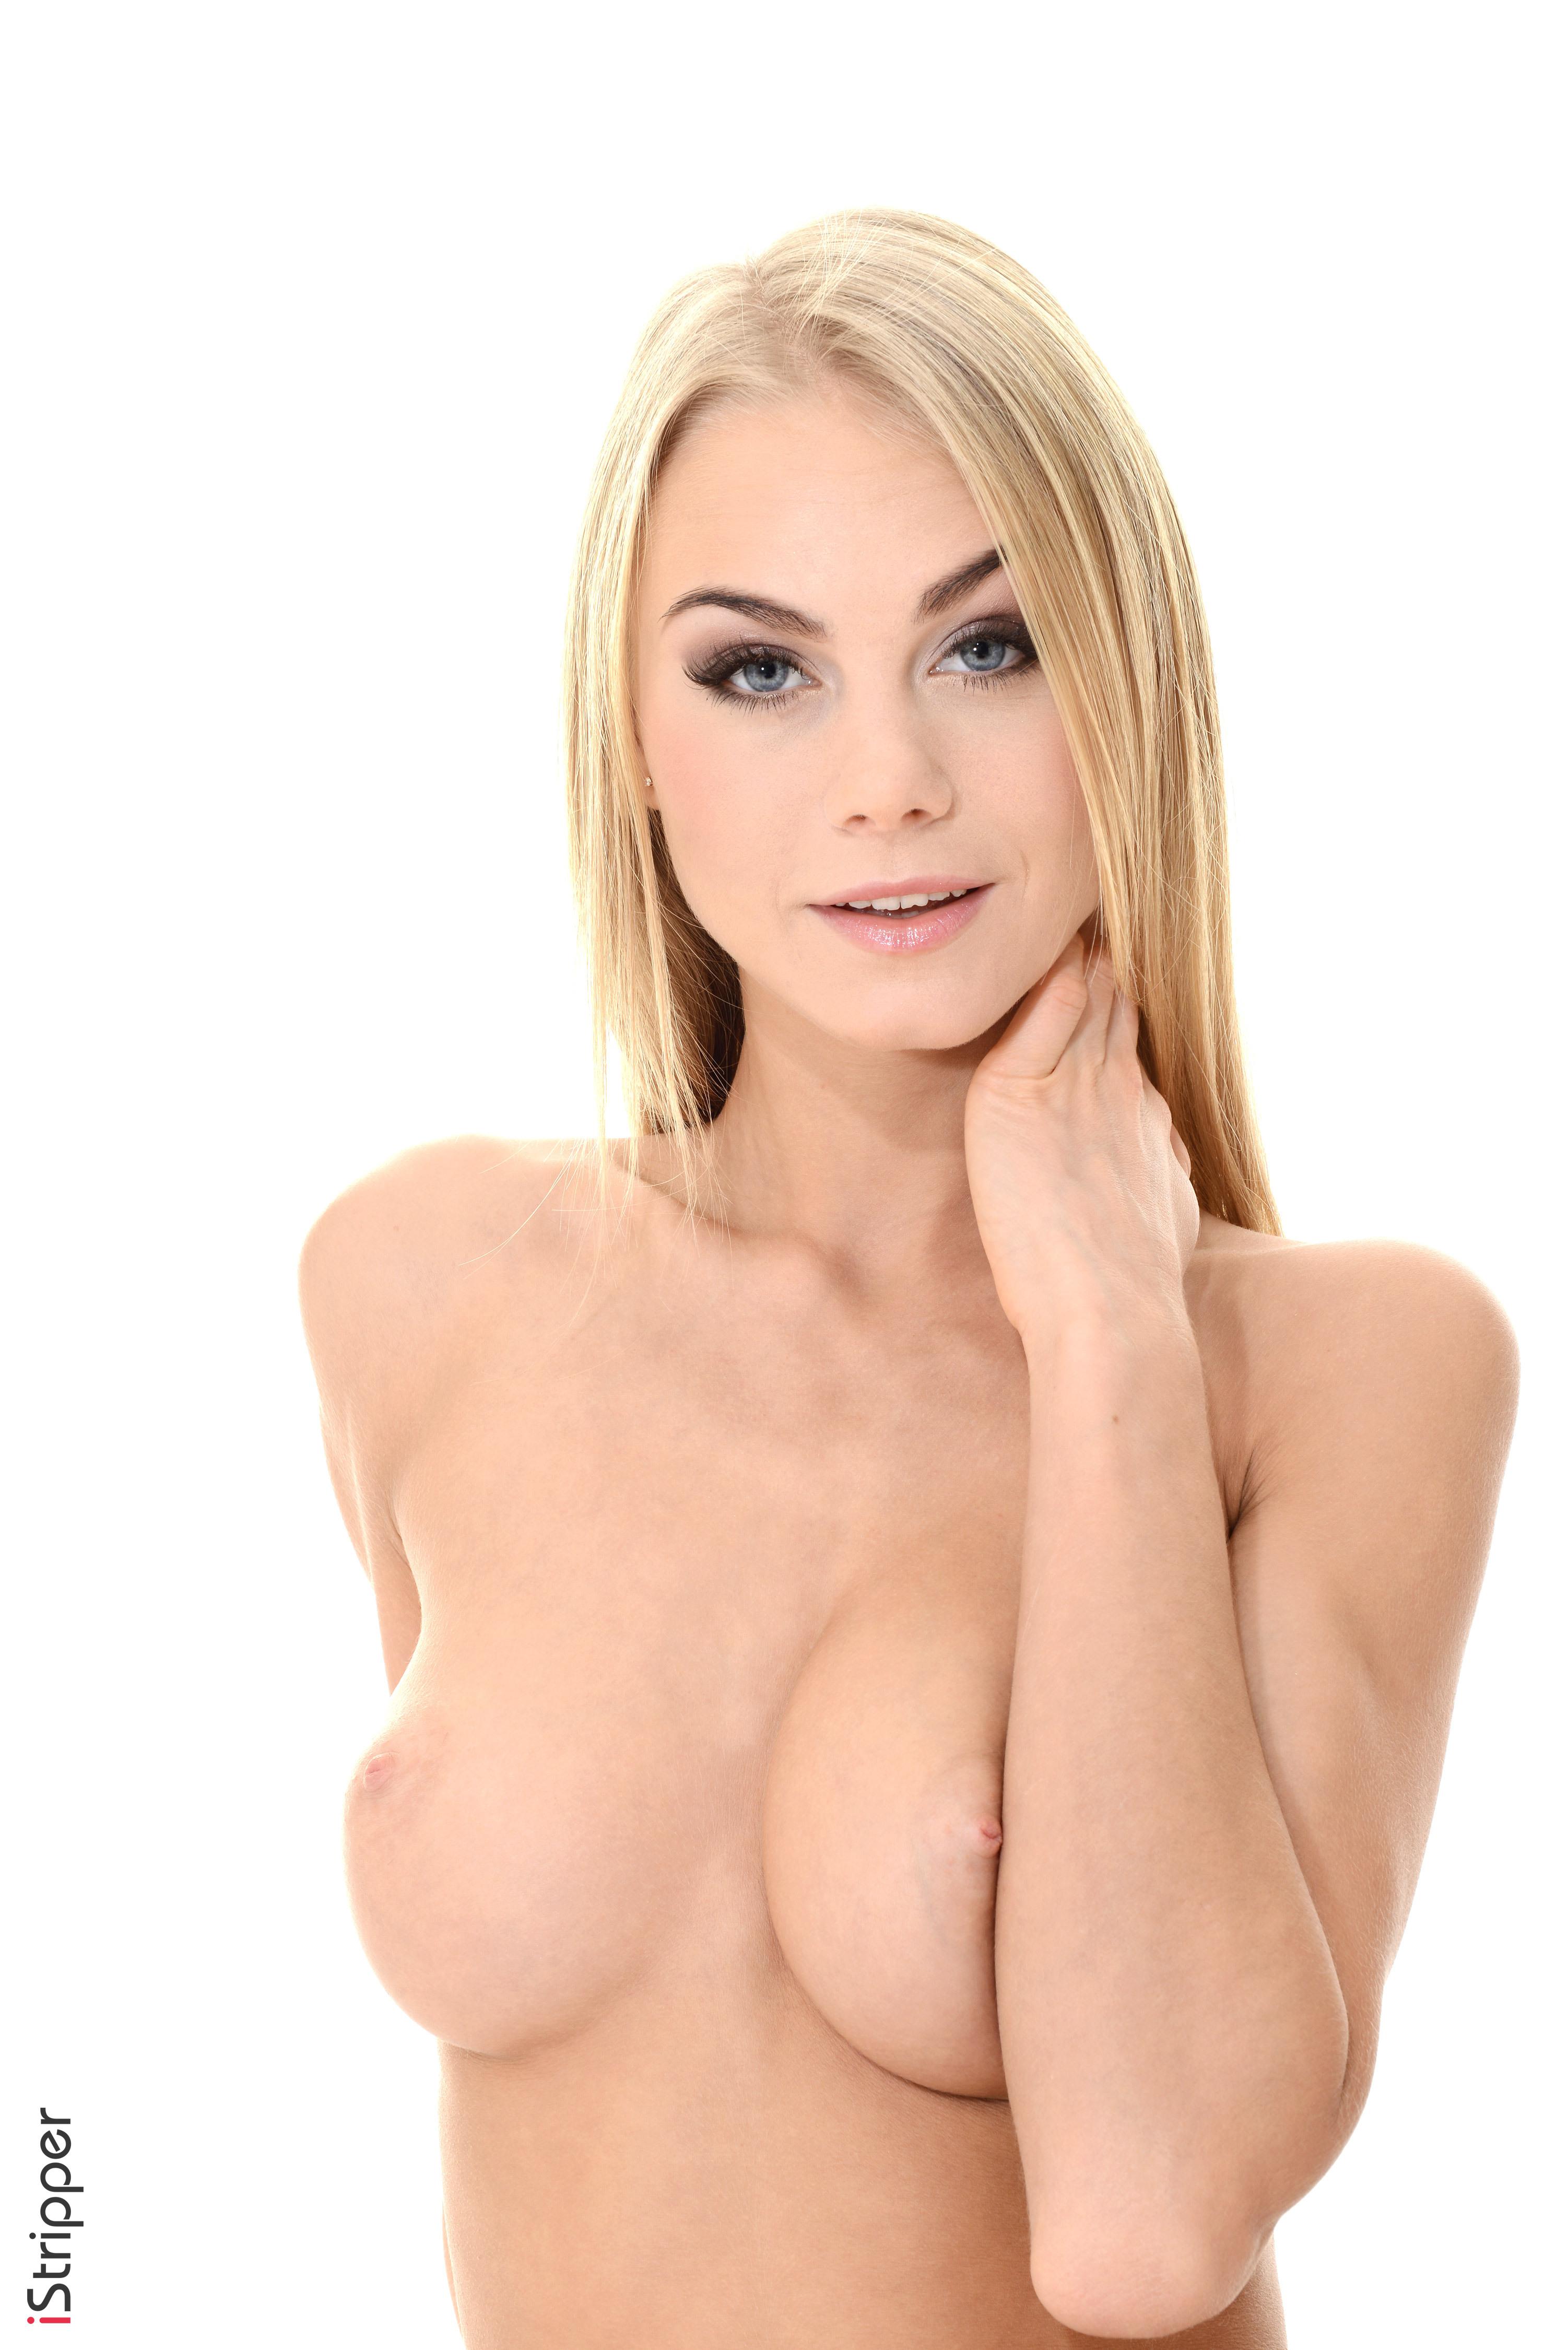 desktop stripper all models free